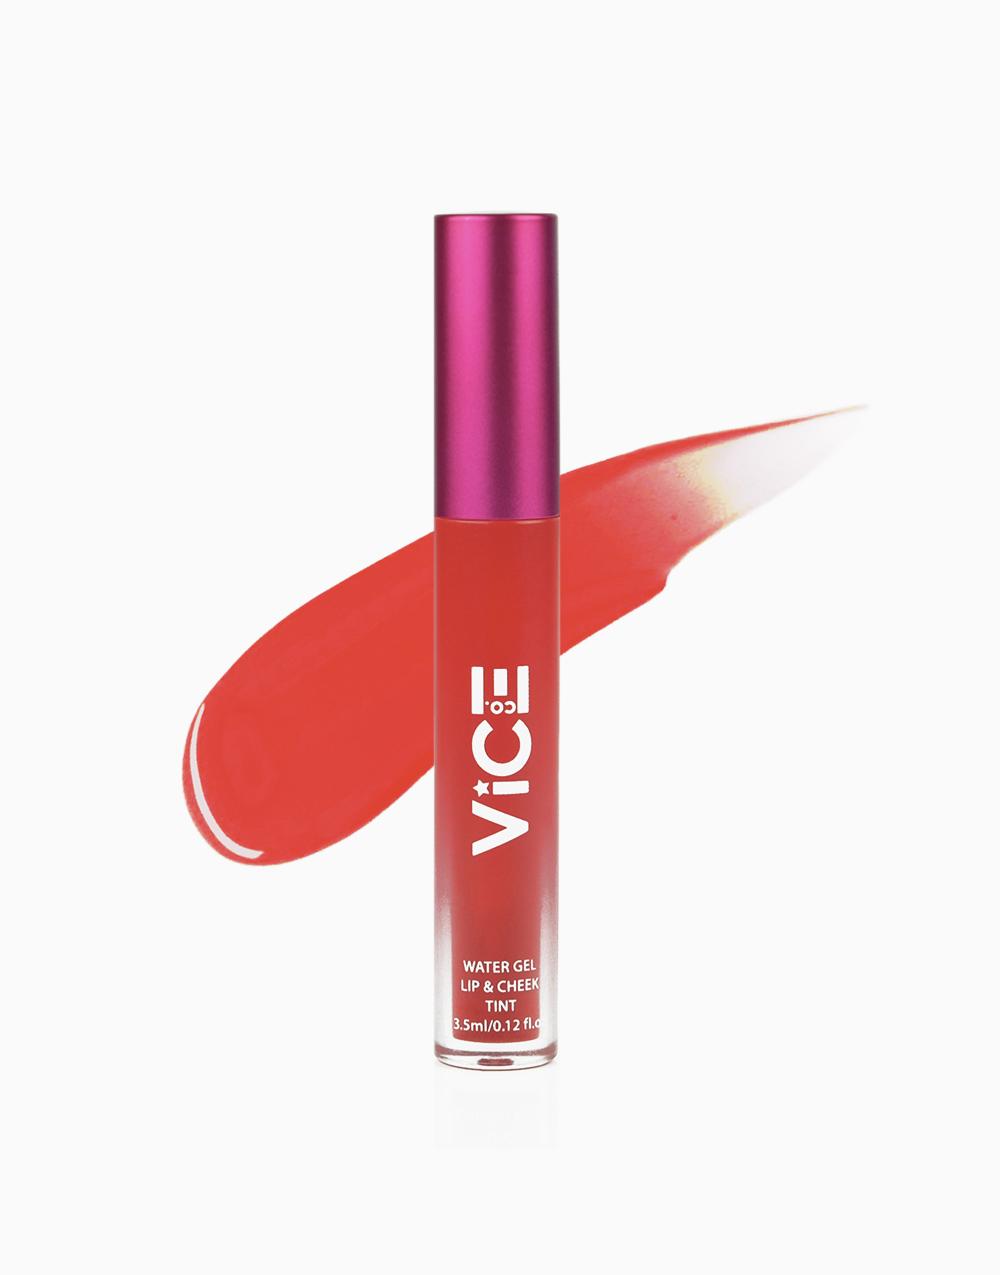 Lip & Cheek Tint (3.5ml) by Vice Cosmetics | Kyondi